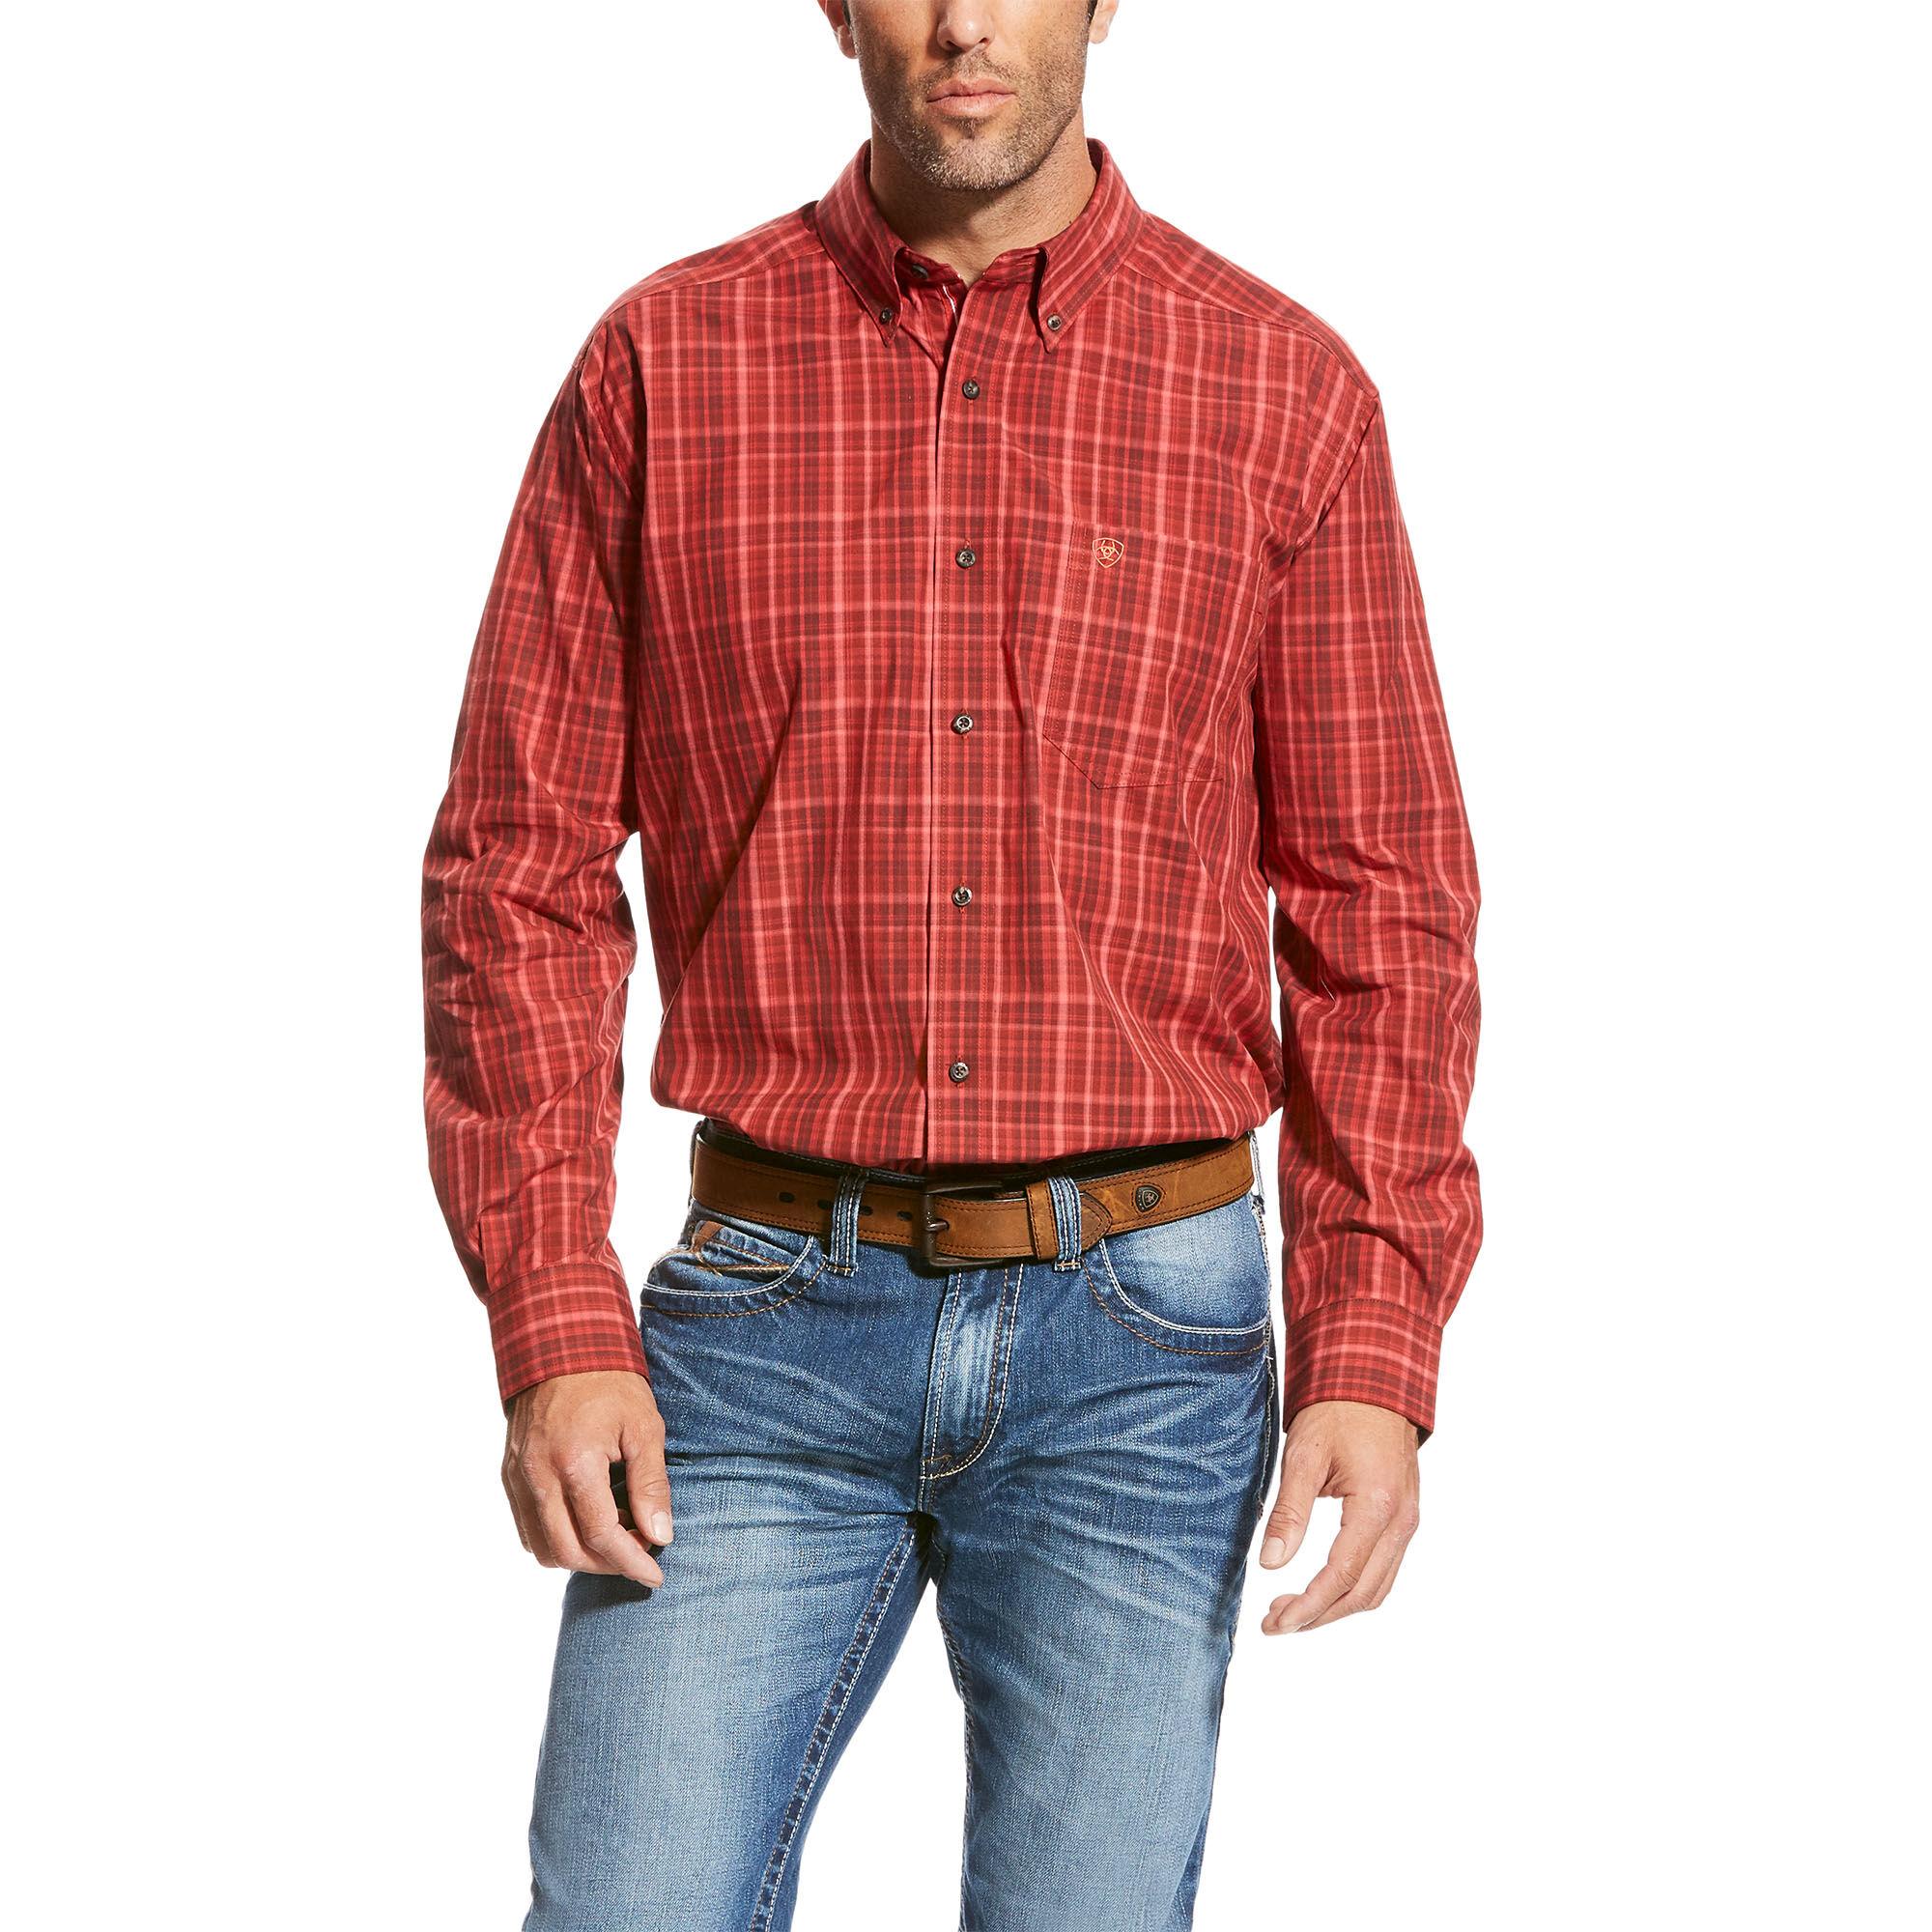 Pro Series Tadlock Shirt